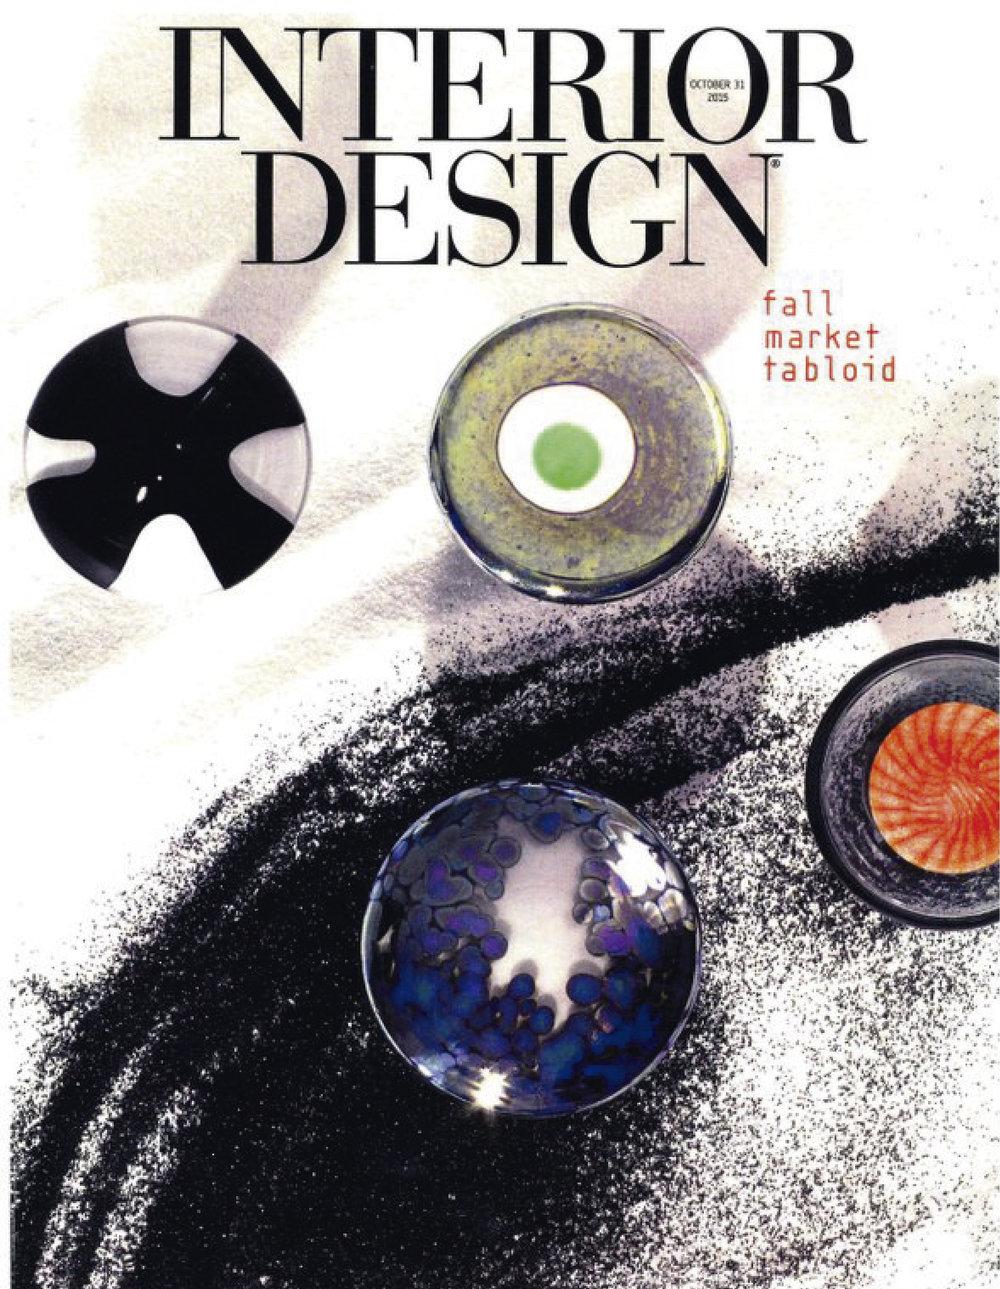 interior_design 01.jpg